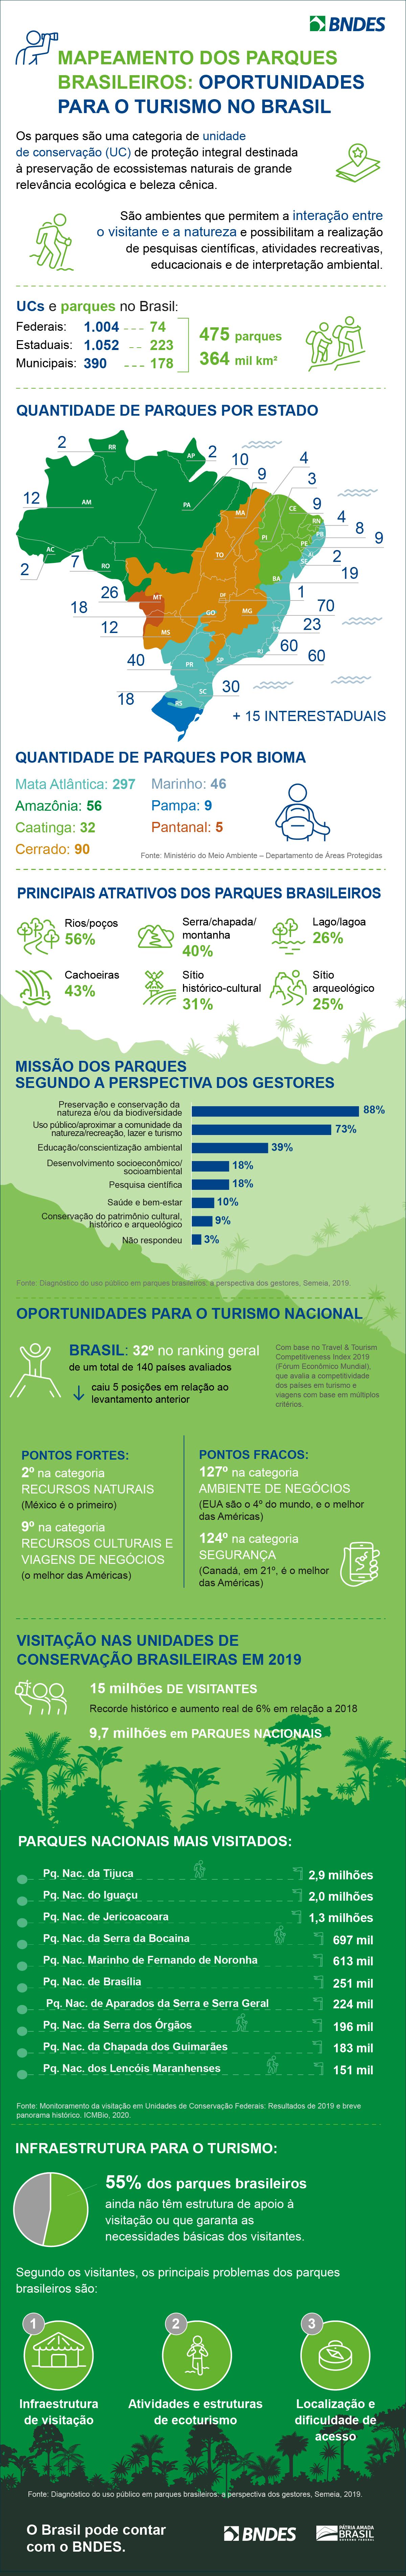 BNDES_Infografico_Parques_BR_final